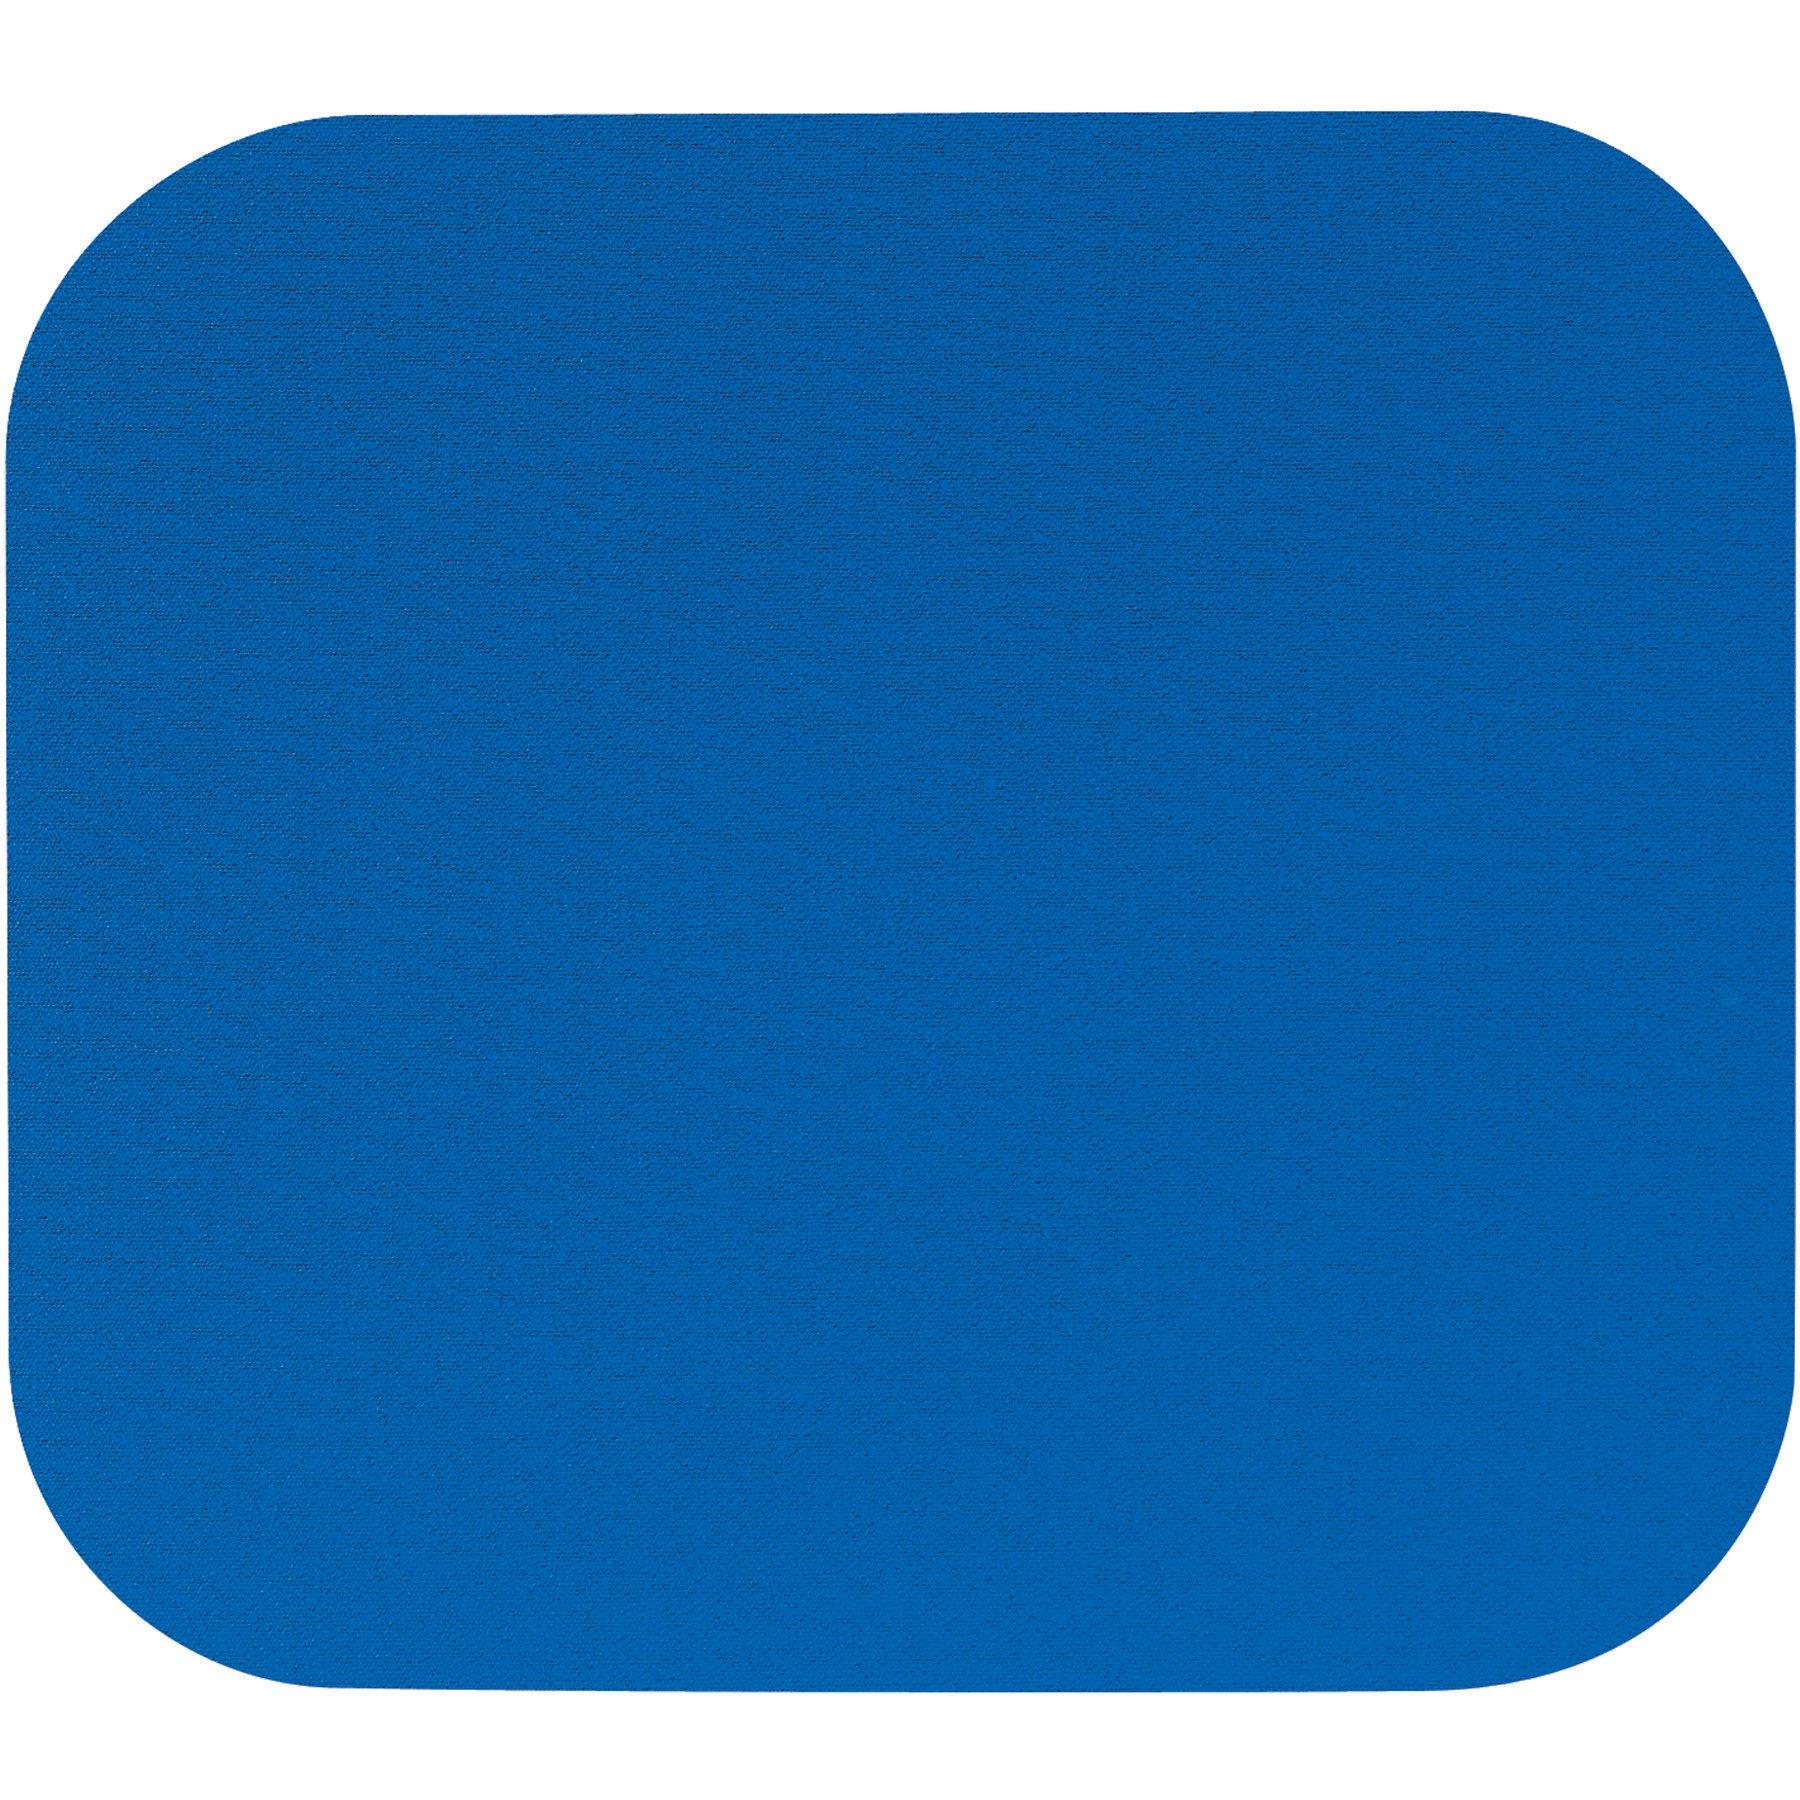 Fellowes 58021 Medium Mouse Pad (Blue)